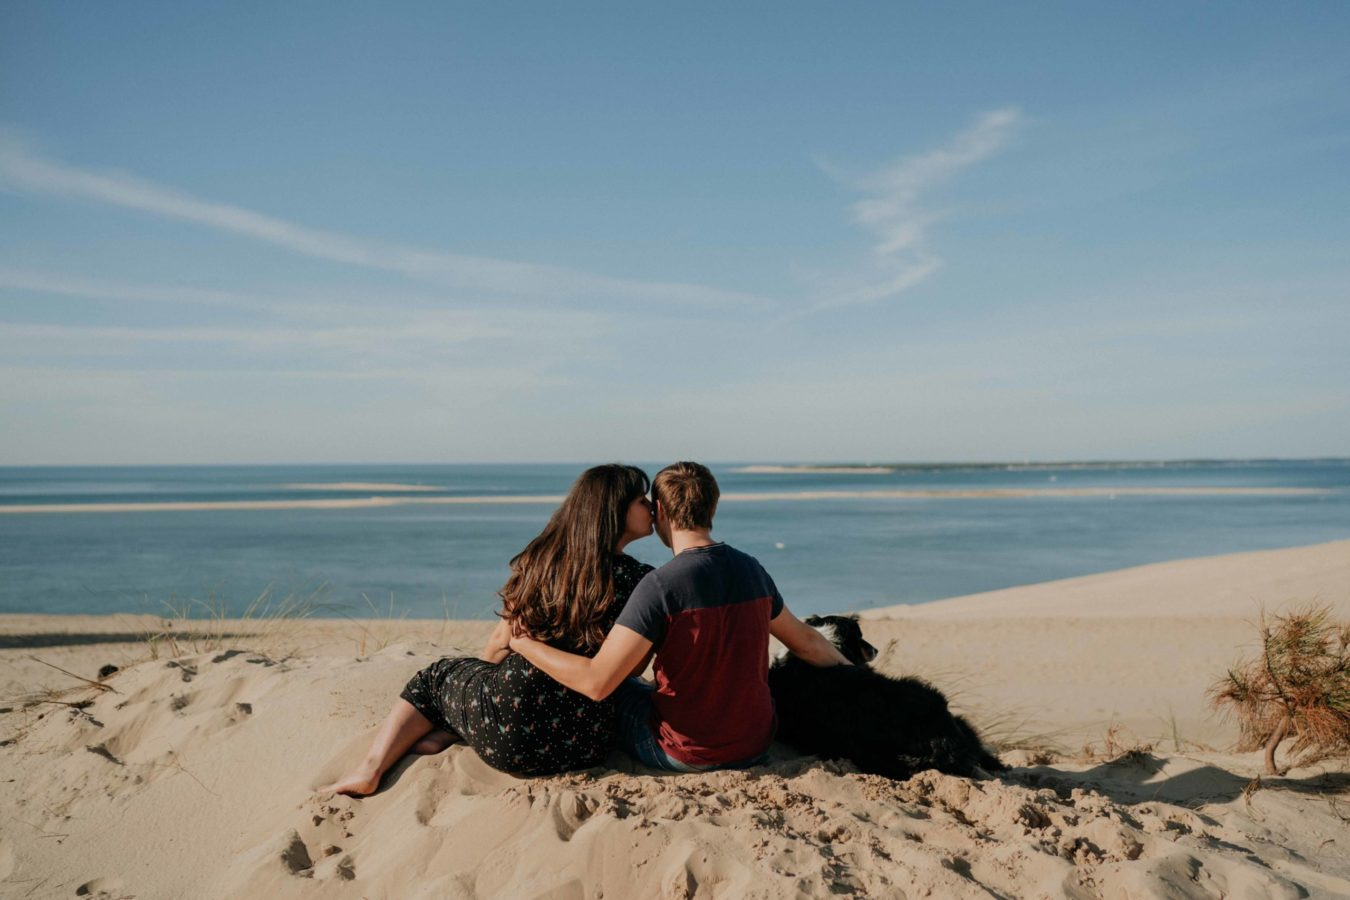 seance-photo-dune-du-pilat-grossesse-bordeaux-pyla-ulrike-photographe-tours